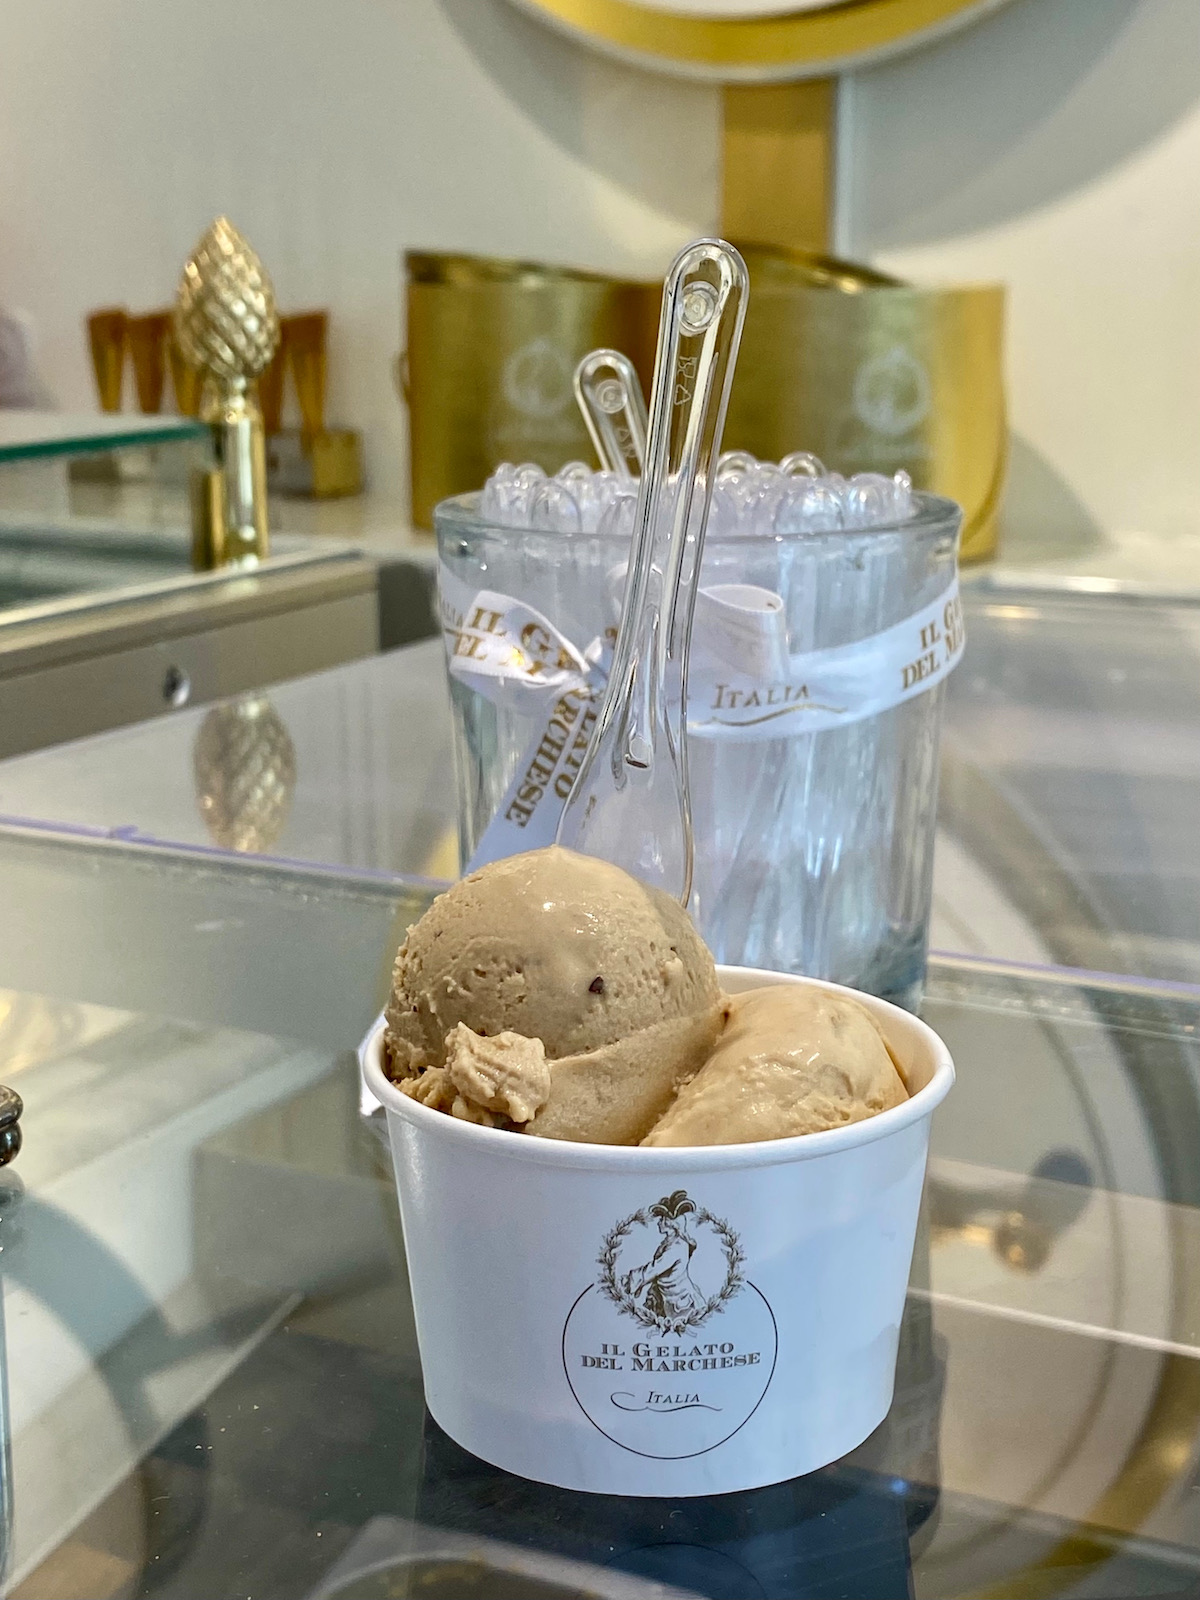 best ice cream in paris il gelato del marchese